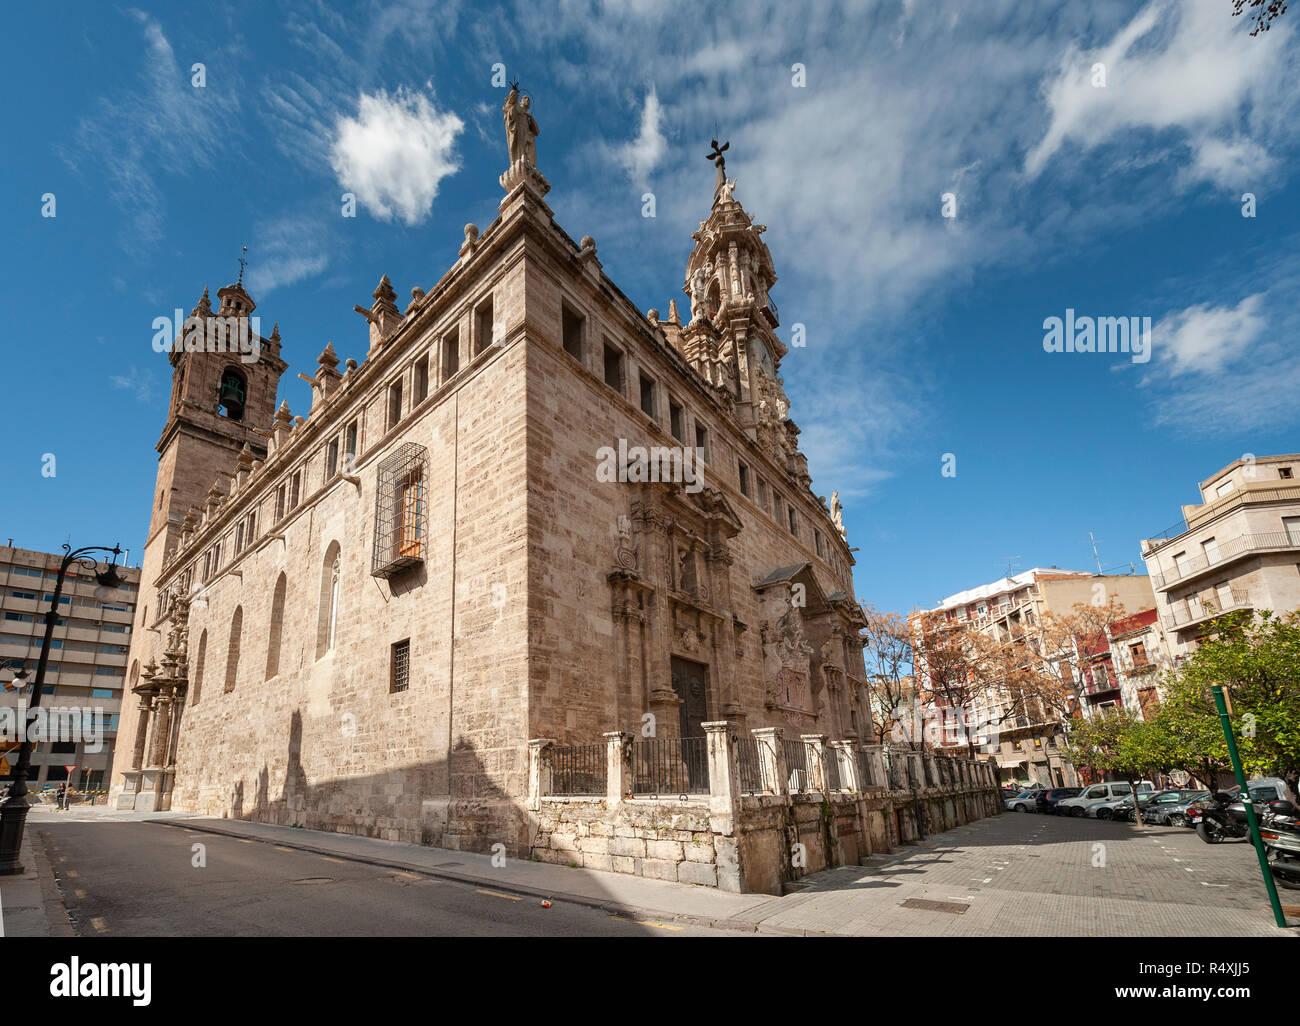 Església de Sant Joan del Mercat Valencia Spain Iglesia de los Santos Juanes - Stock Image